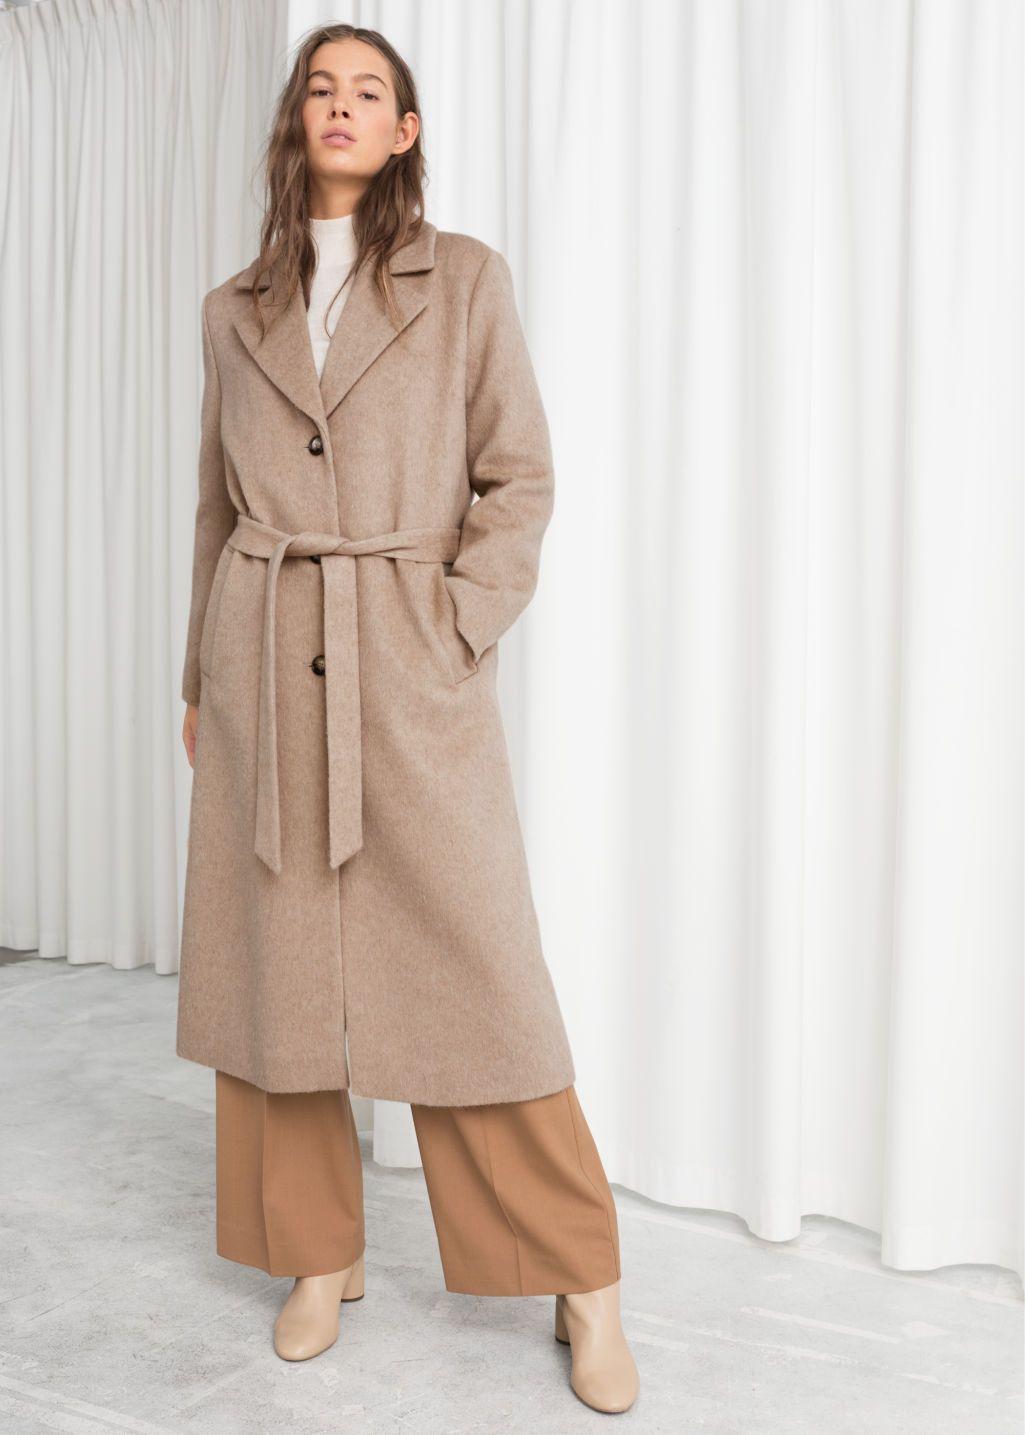 Oversized Alpaca Blend Coat Beige Woolcoats Other Stories Coat Beige Coat Beige Winter Coat [ 1435 x 1025 Pixel ]